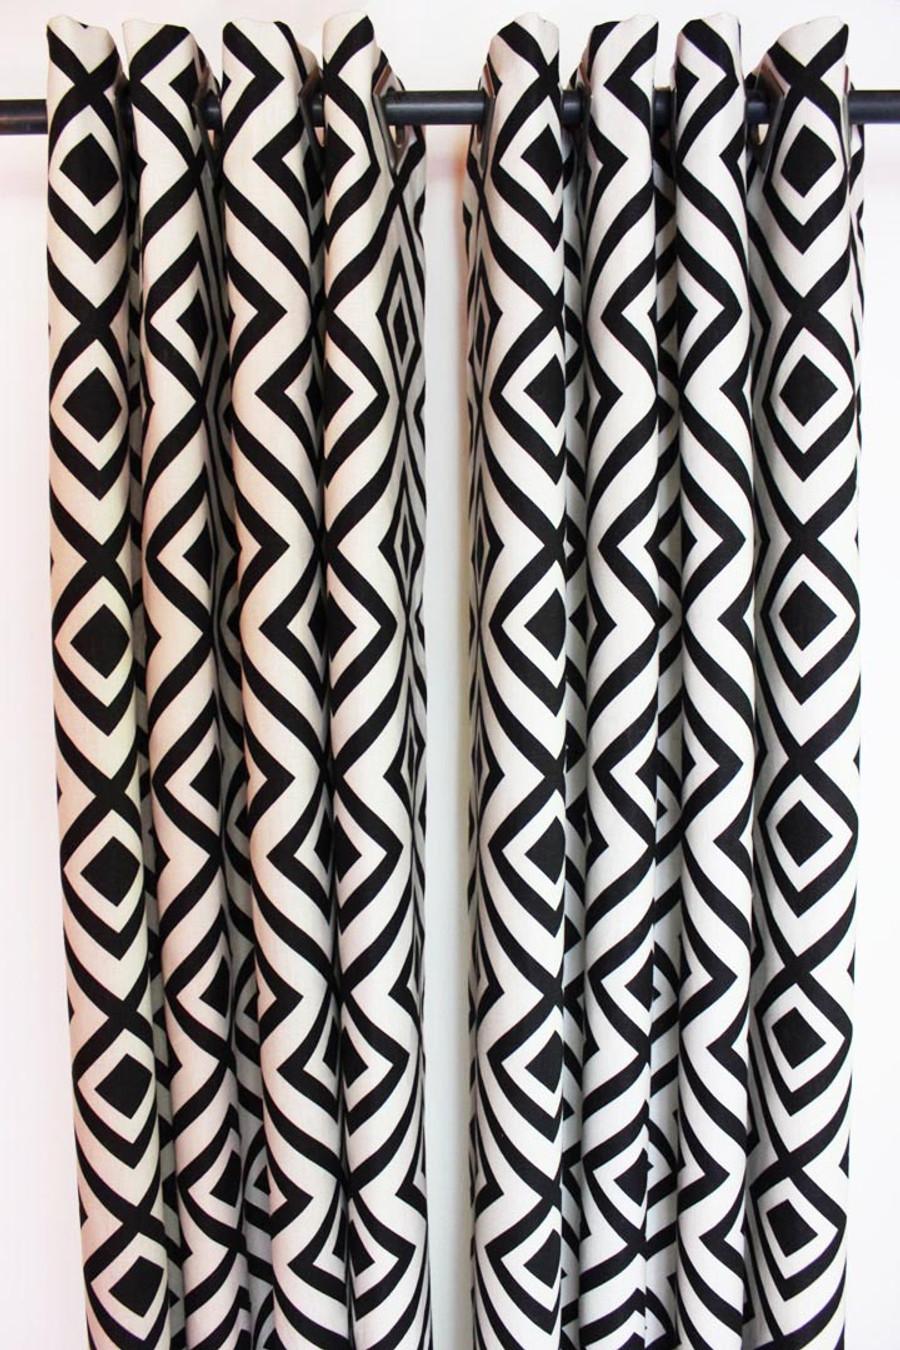 Custom Grommet Drapes by Lynn Chalk in David Hicks La Fiorentina Domino